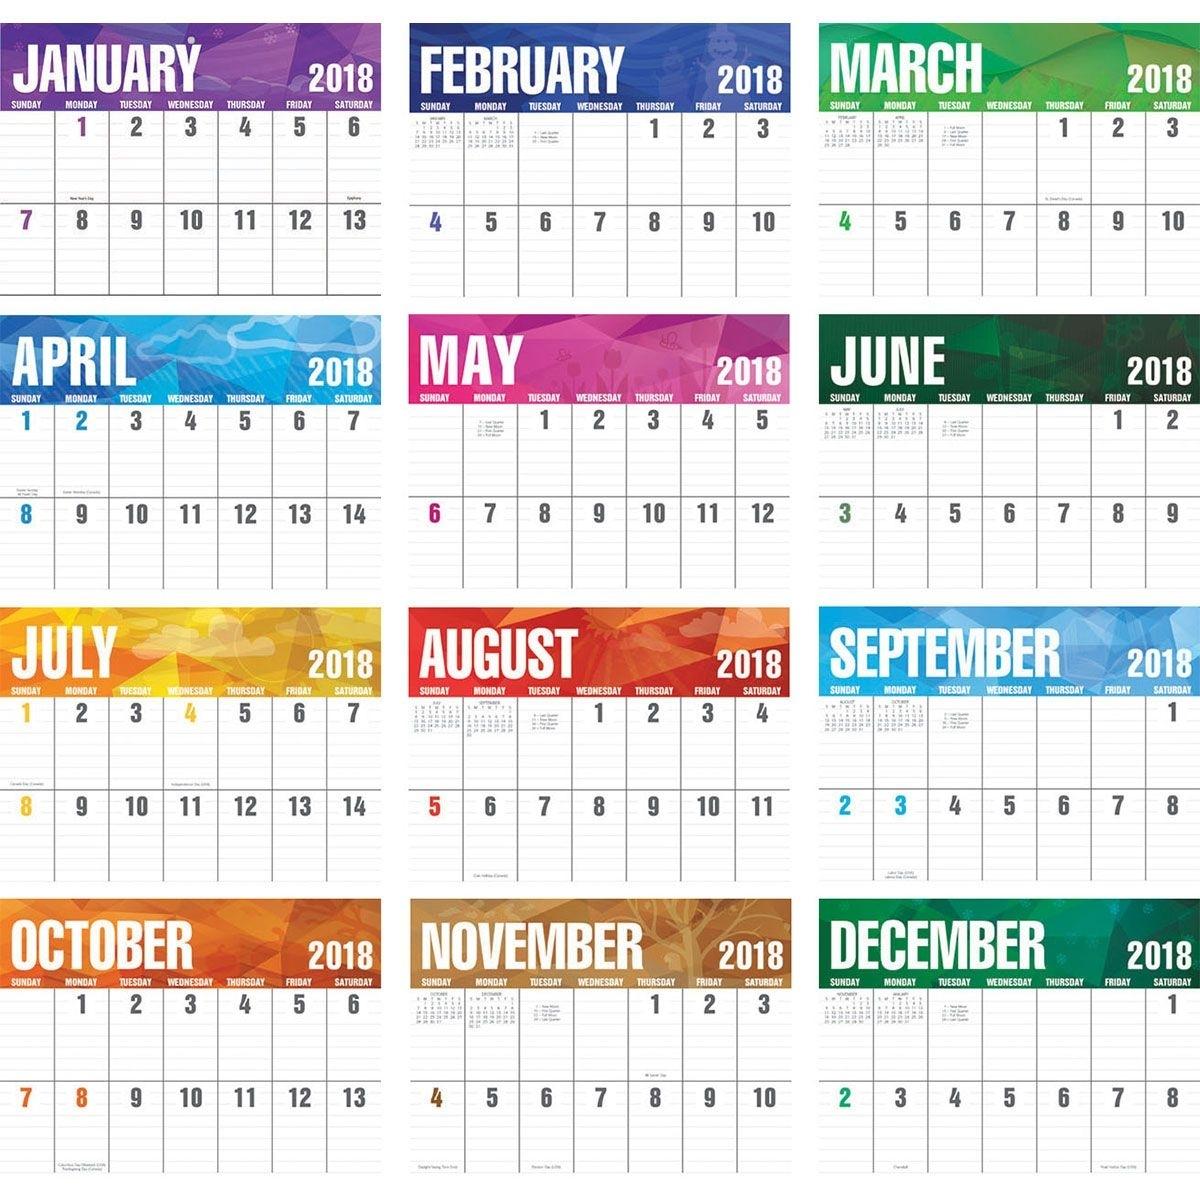 2018 Big Block Calendar, 2018 Imprinted Calendars, 2018